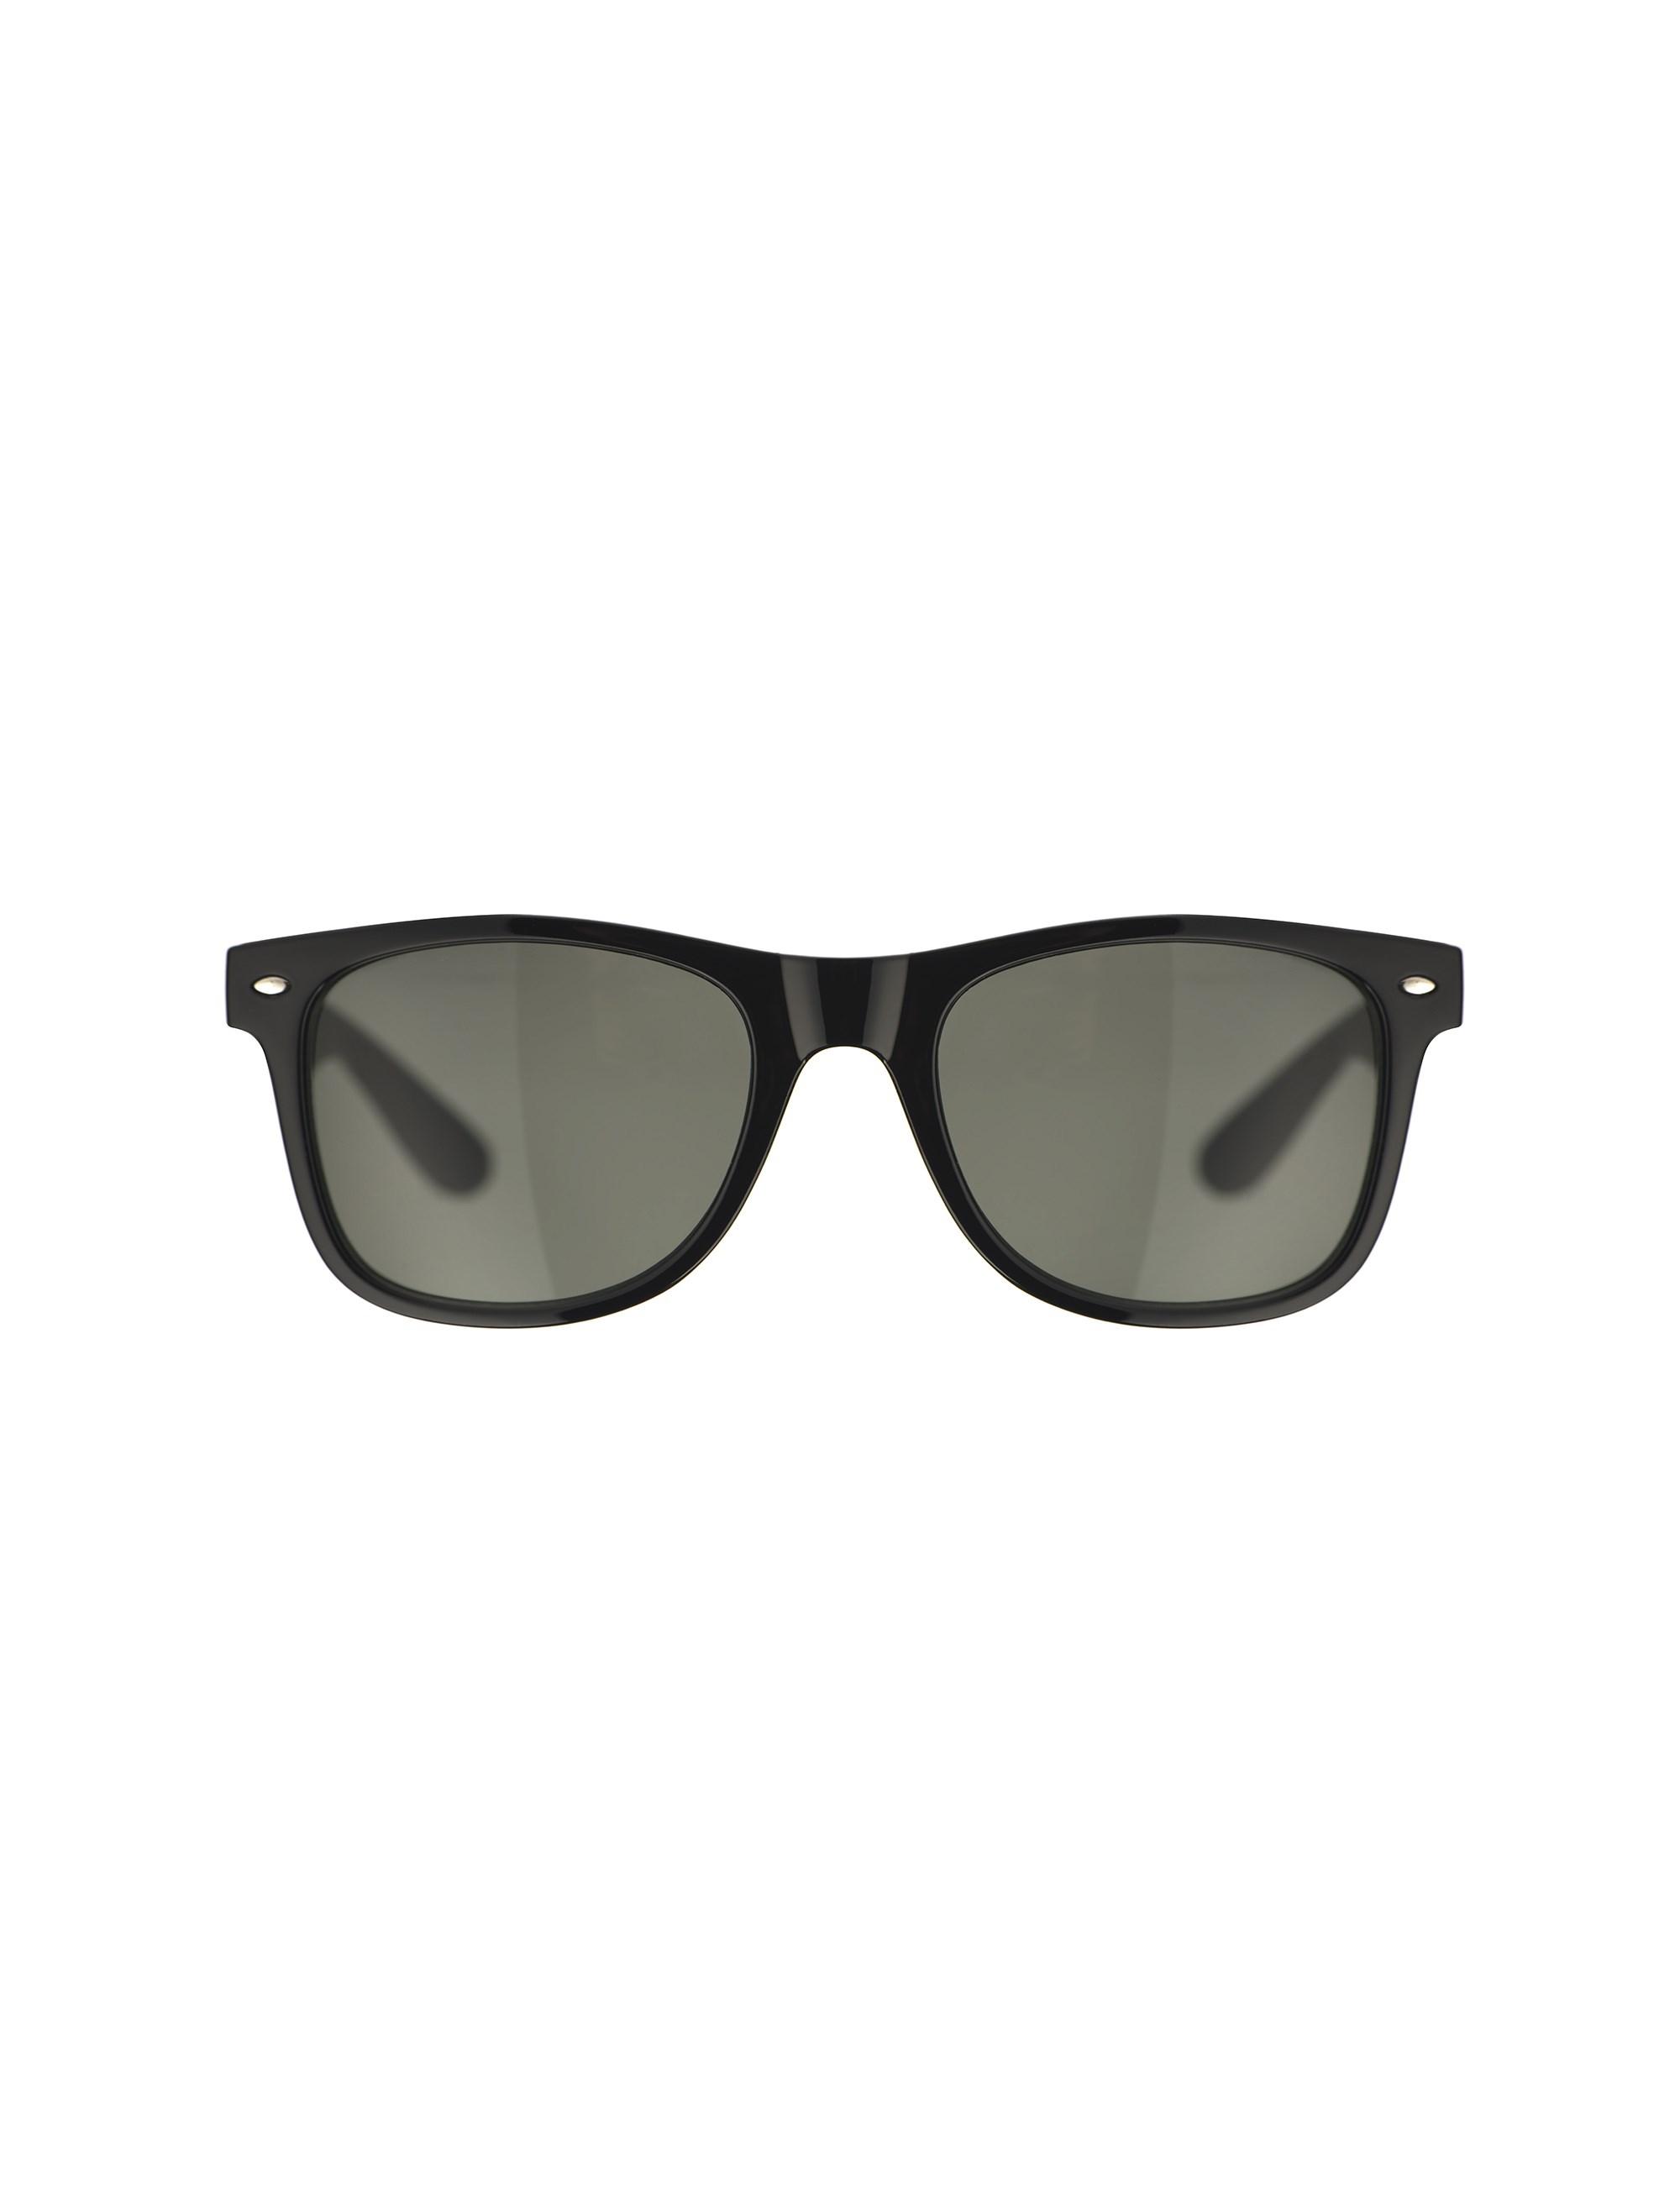 عینک آفتابی مربعی زنانه - اونلی تک سایز